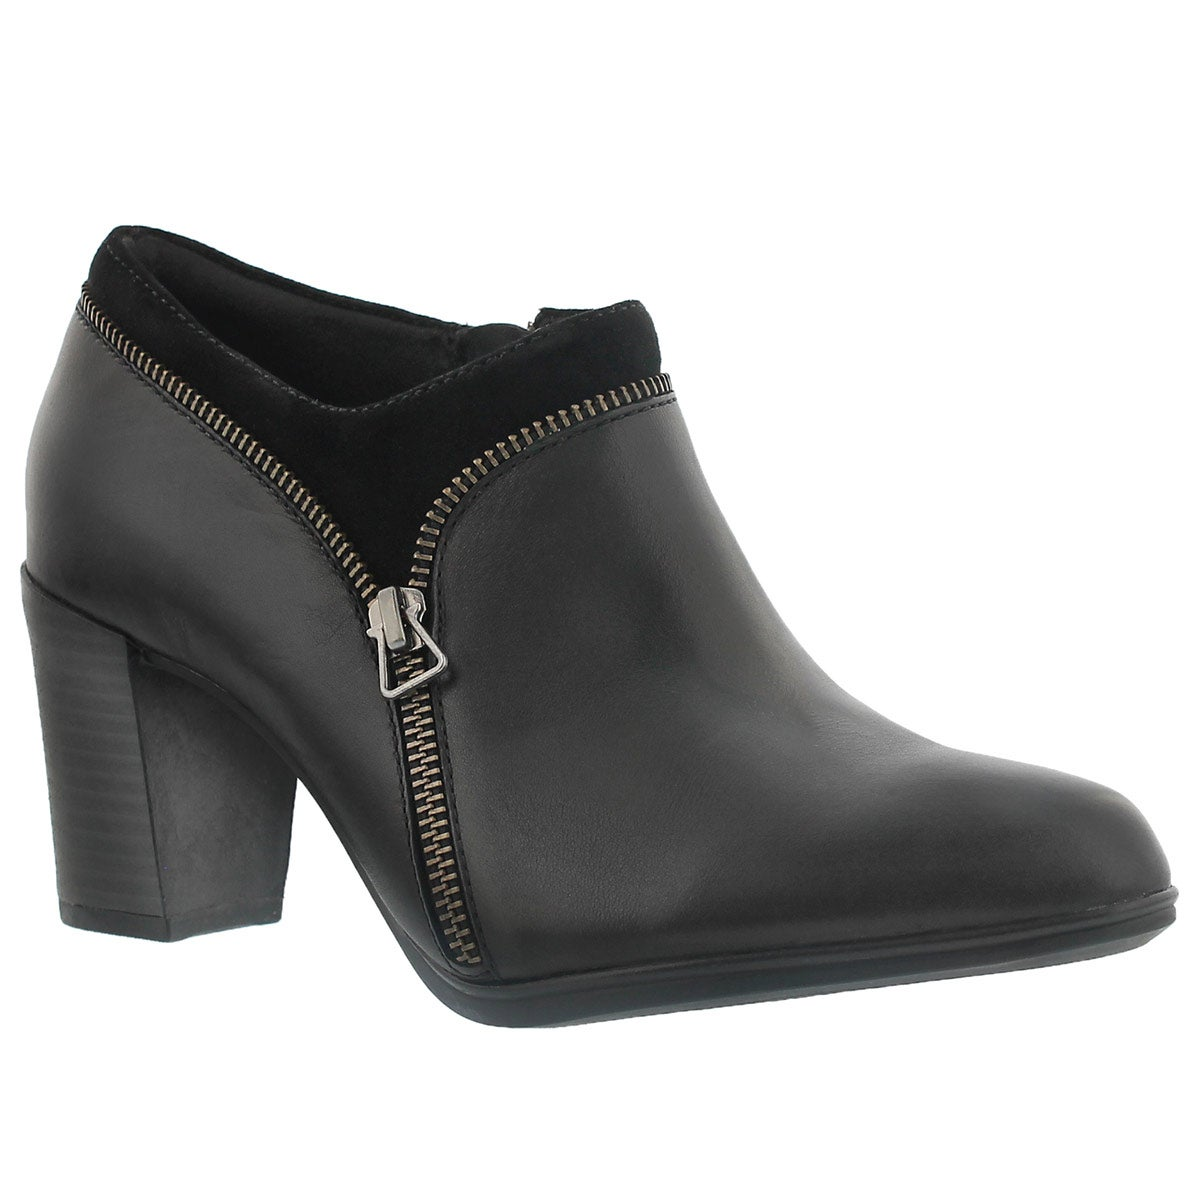 Lds Araya Morgan black dress bootie